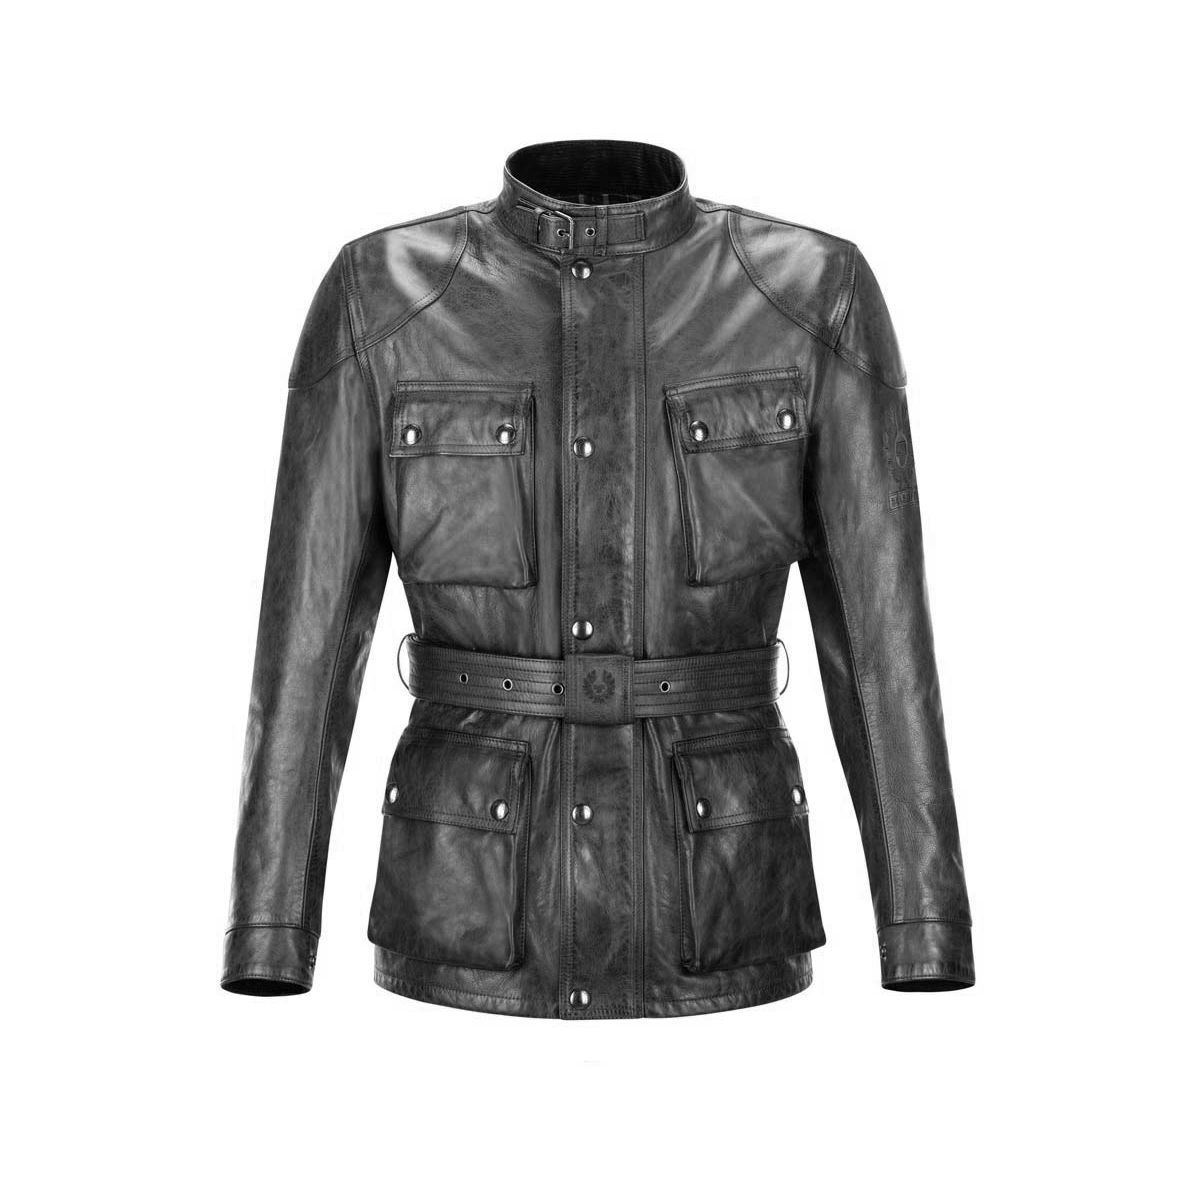 Belstaff Classic Tourist Trophy Jacket | 20% ($290.00) Off! - RevZilla #womenvest